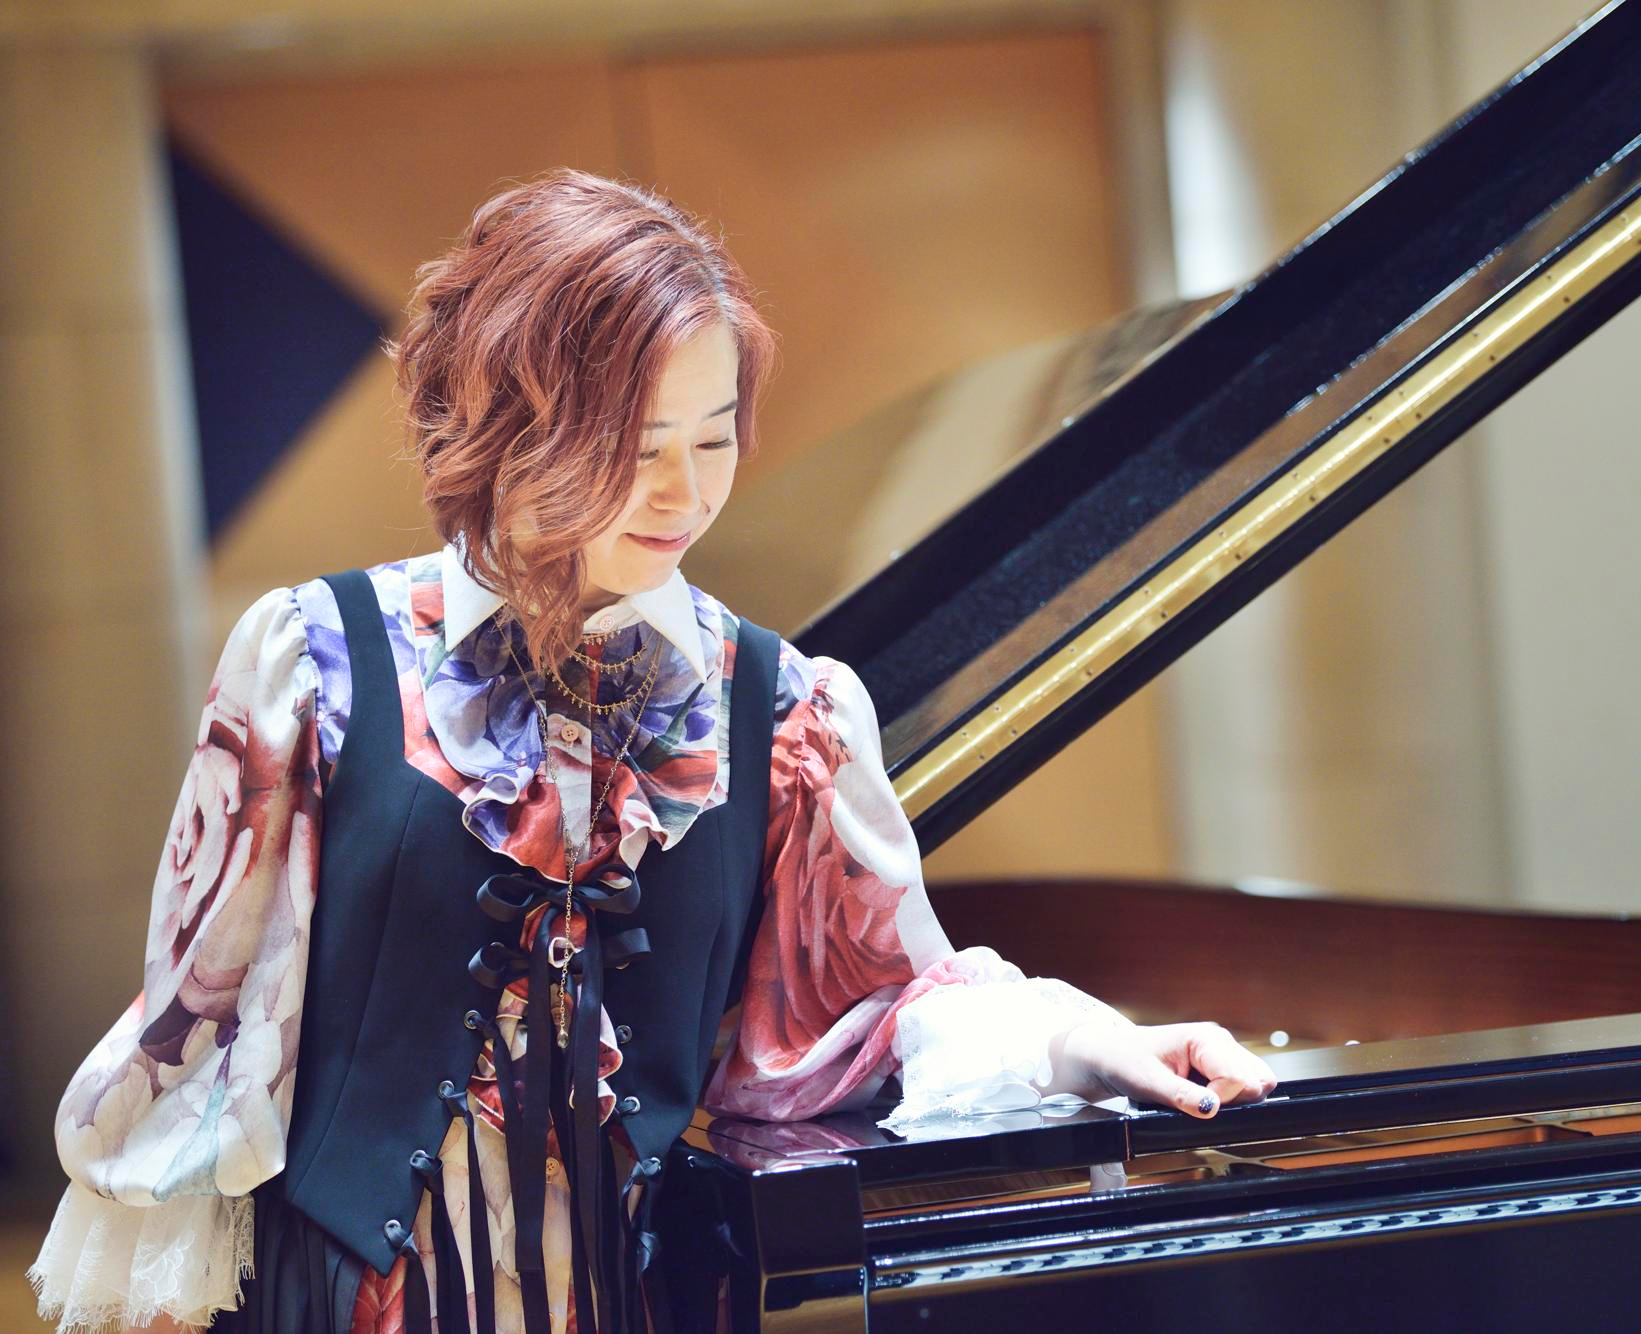 YUKI (歌手)の画像 p1_19